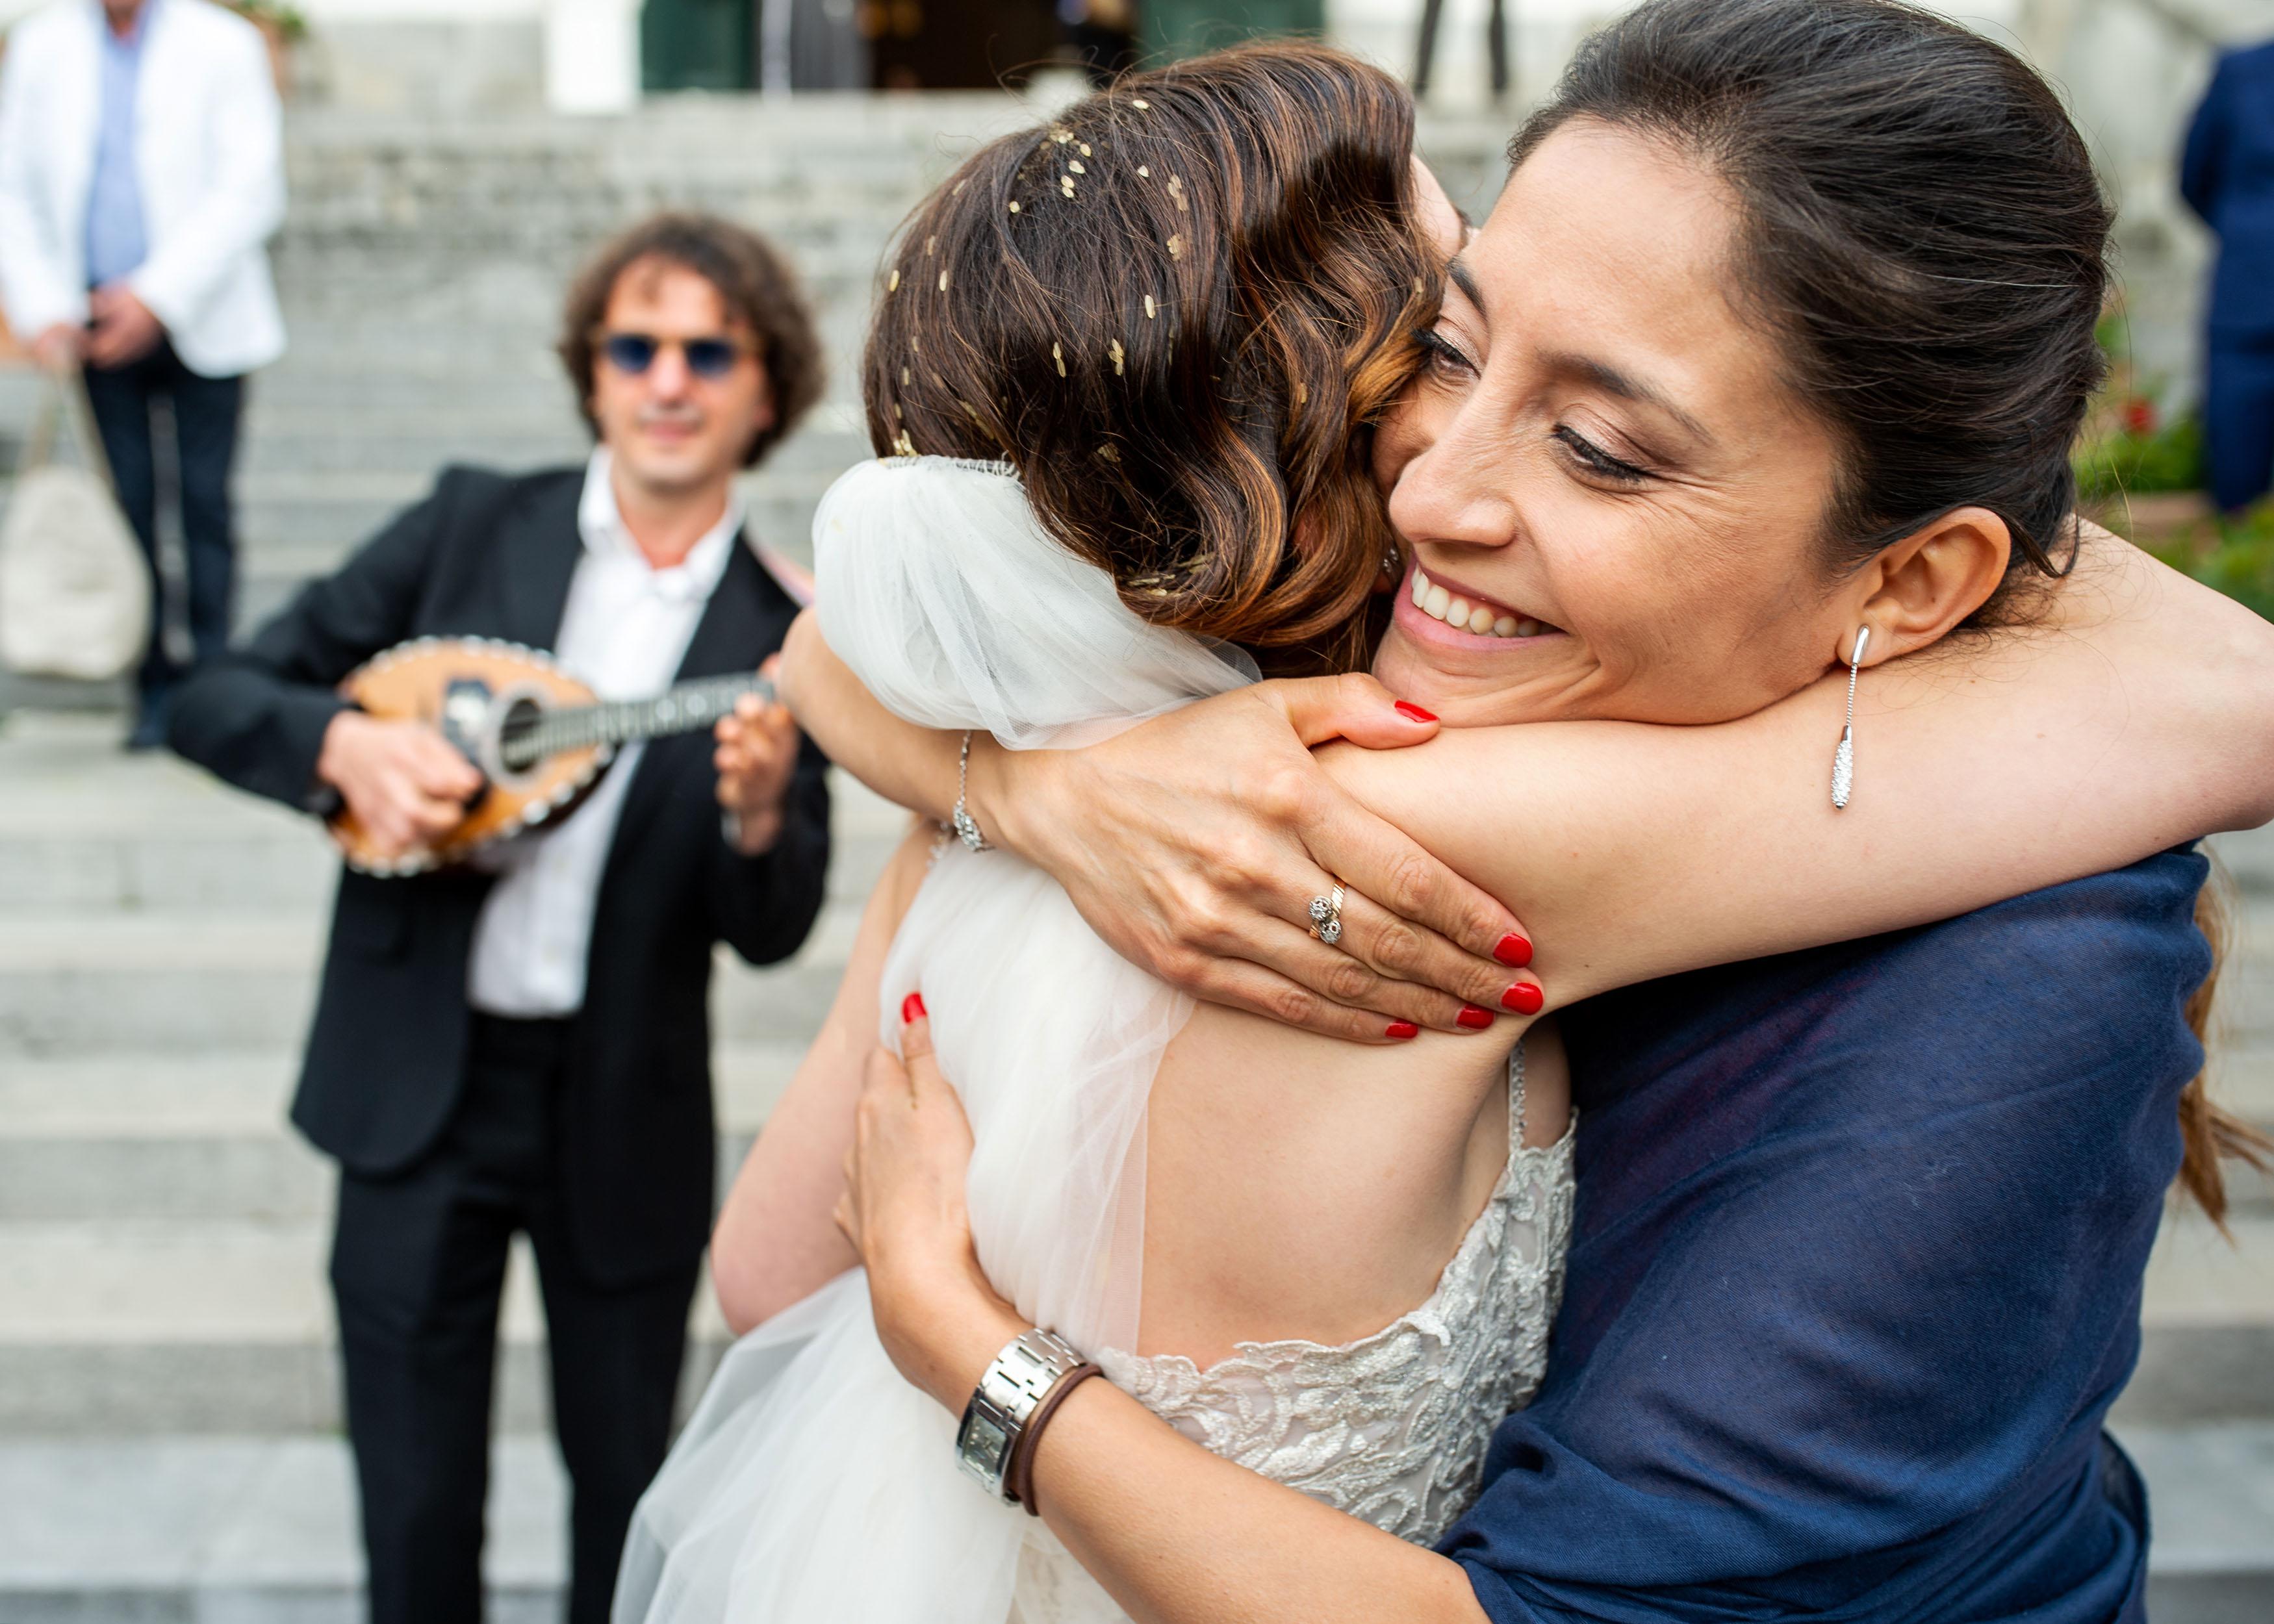 https://www.weddingamalfi.com/wp-content/uploads/Katia-Jorge-18-maggio-2019-31.jpg